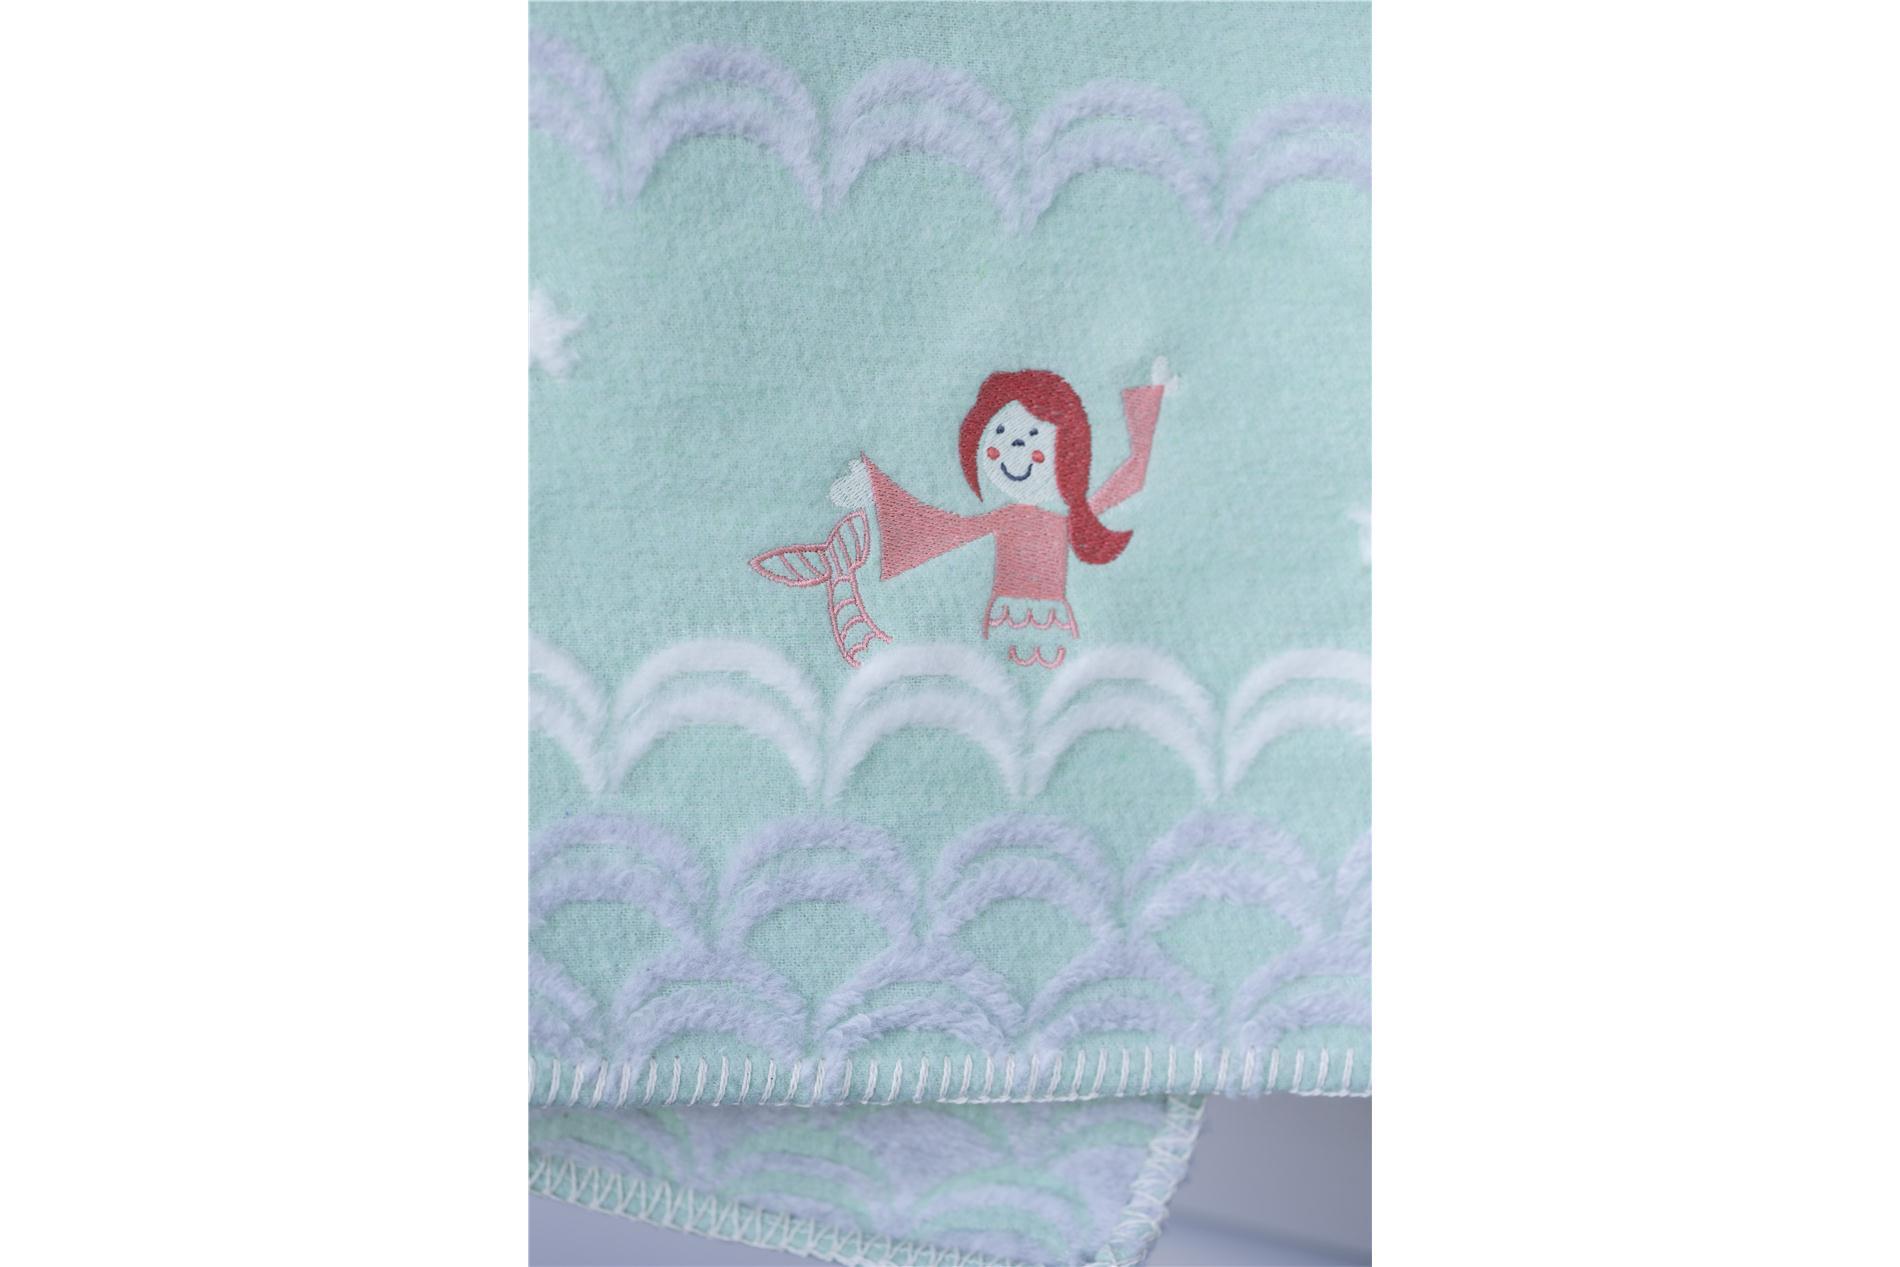 DAVID FUSSENEGGER Decke Juwel Finn, Babydecke, Meerjungfrau mit Stickerei, mint, 65x 90 cm